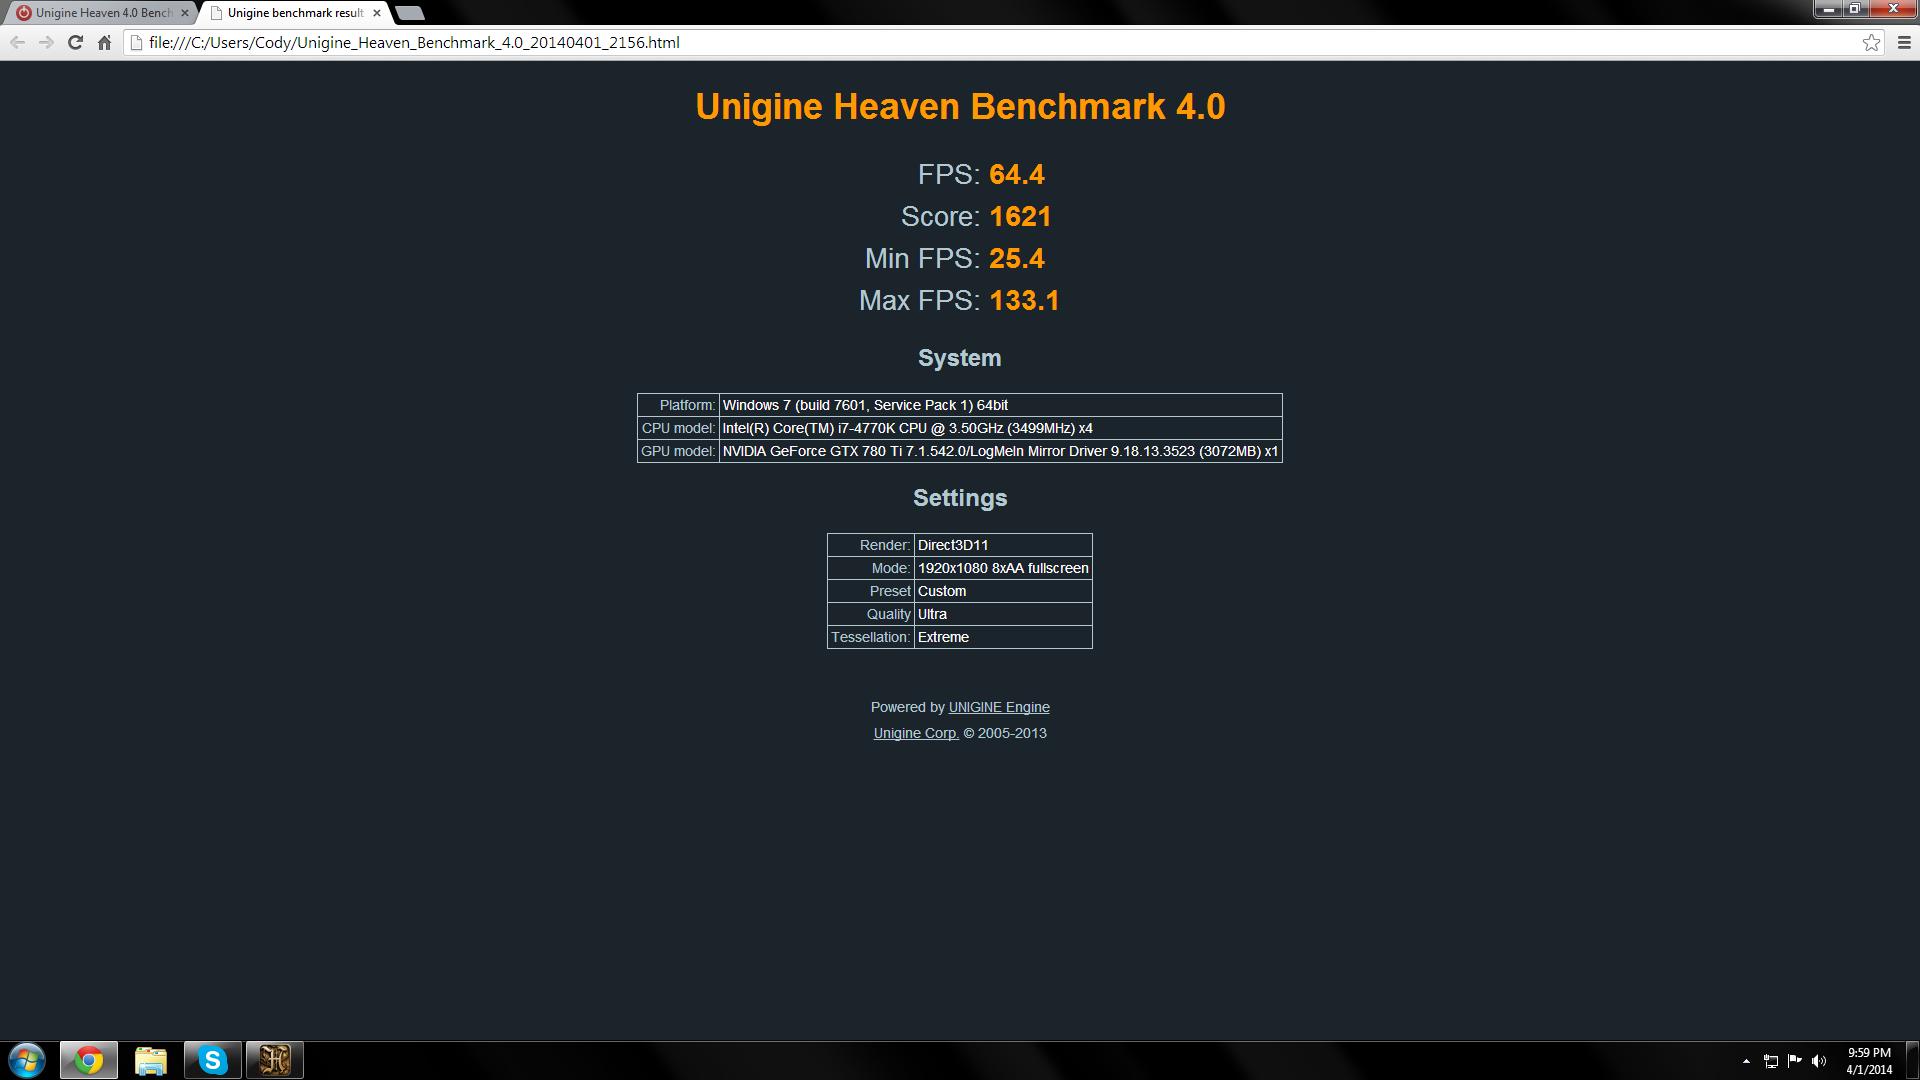 Unigine Heaven 4 0 Benchmark Scores | TechPowerUp Forums